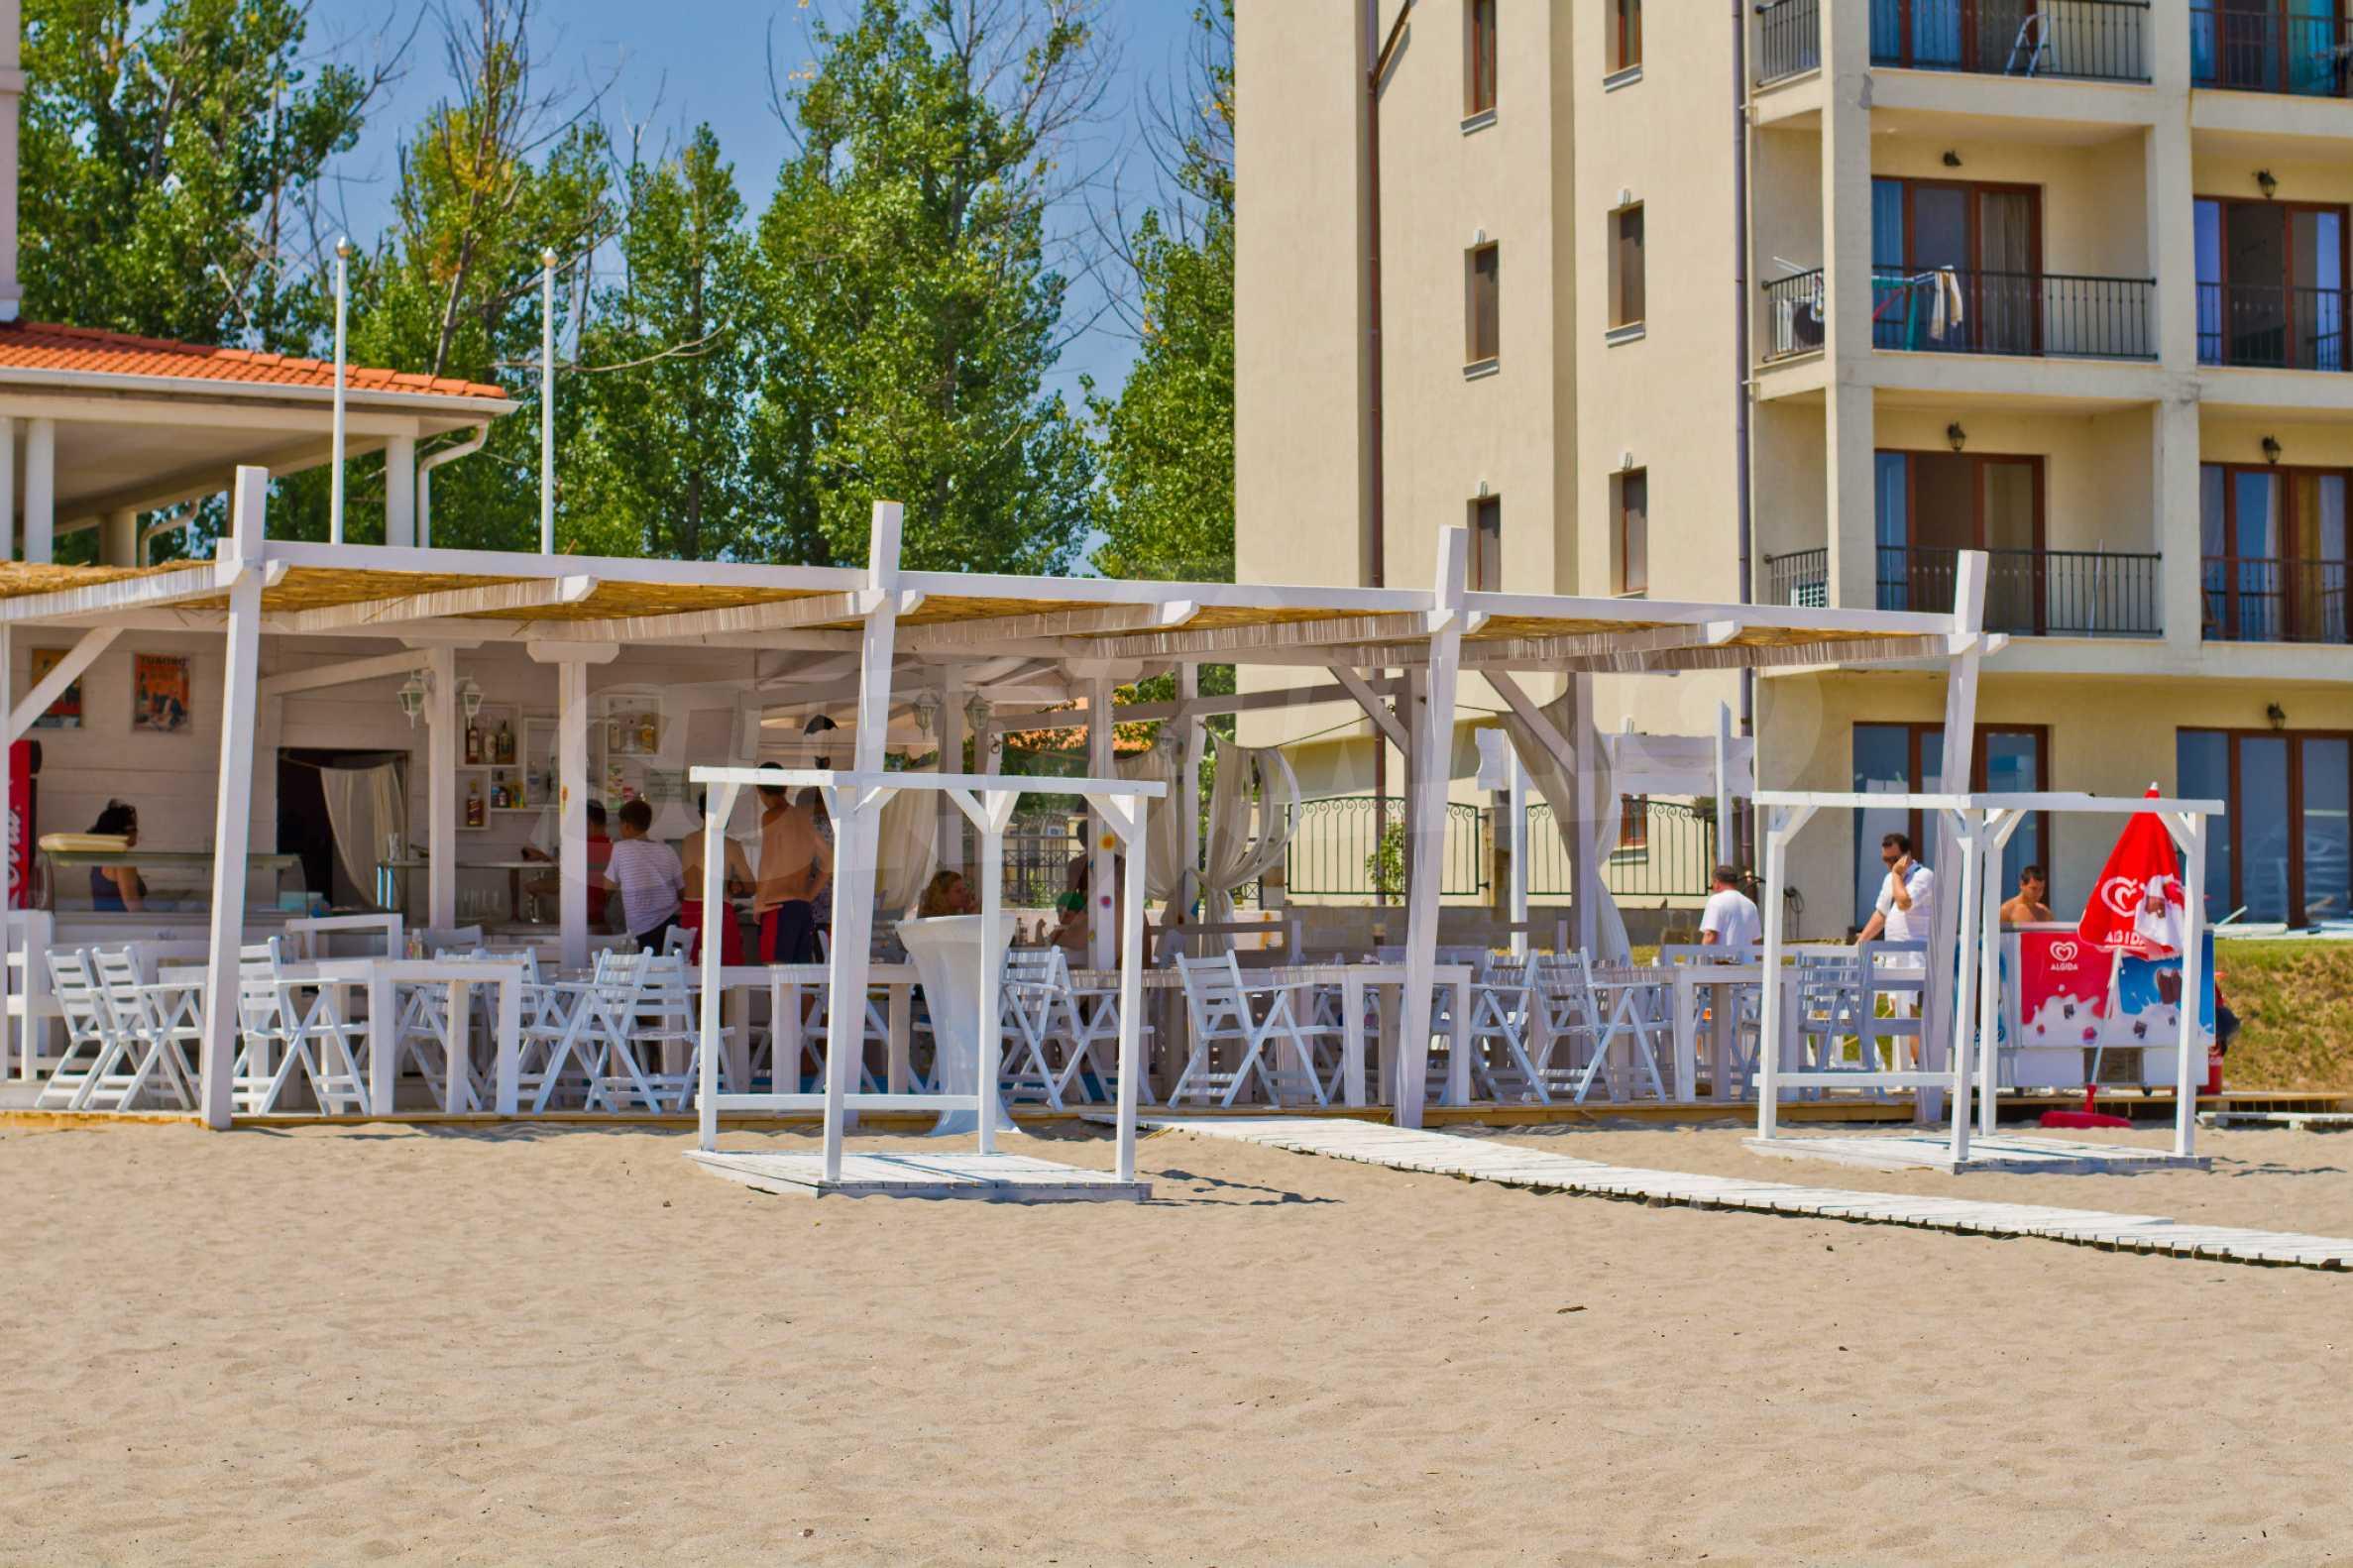 Примеа Бийч Резиденс / Primea Beach Residence 7